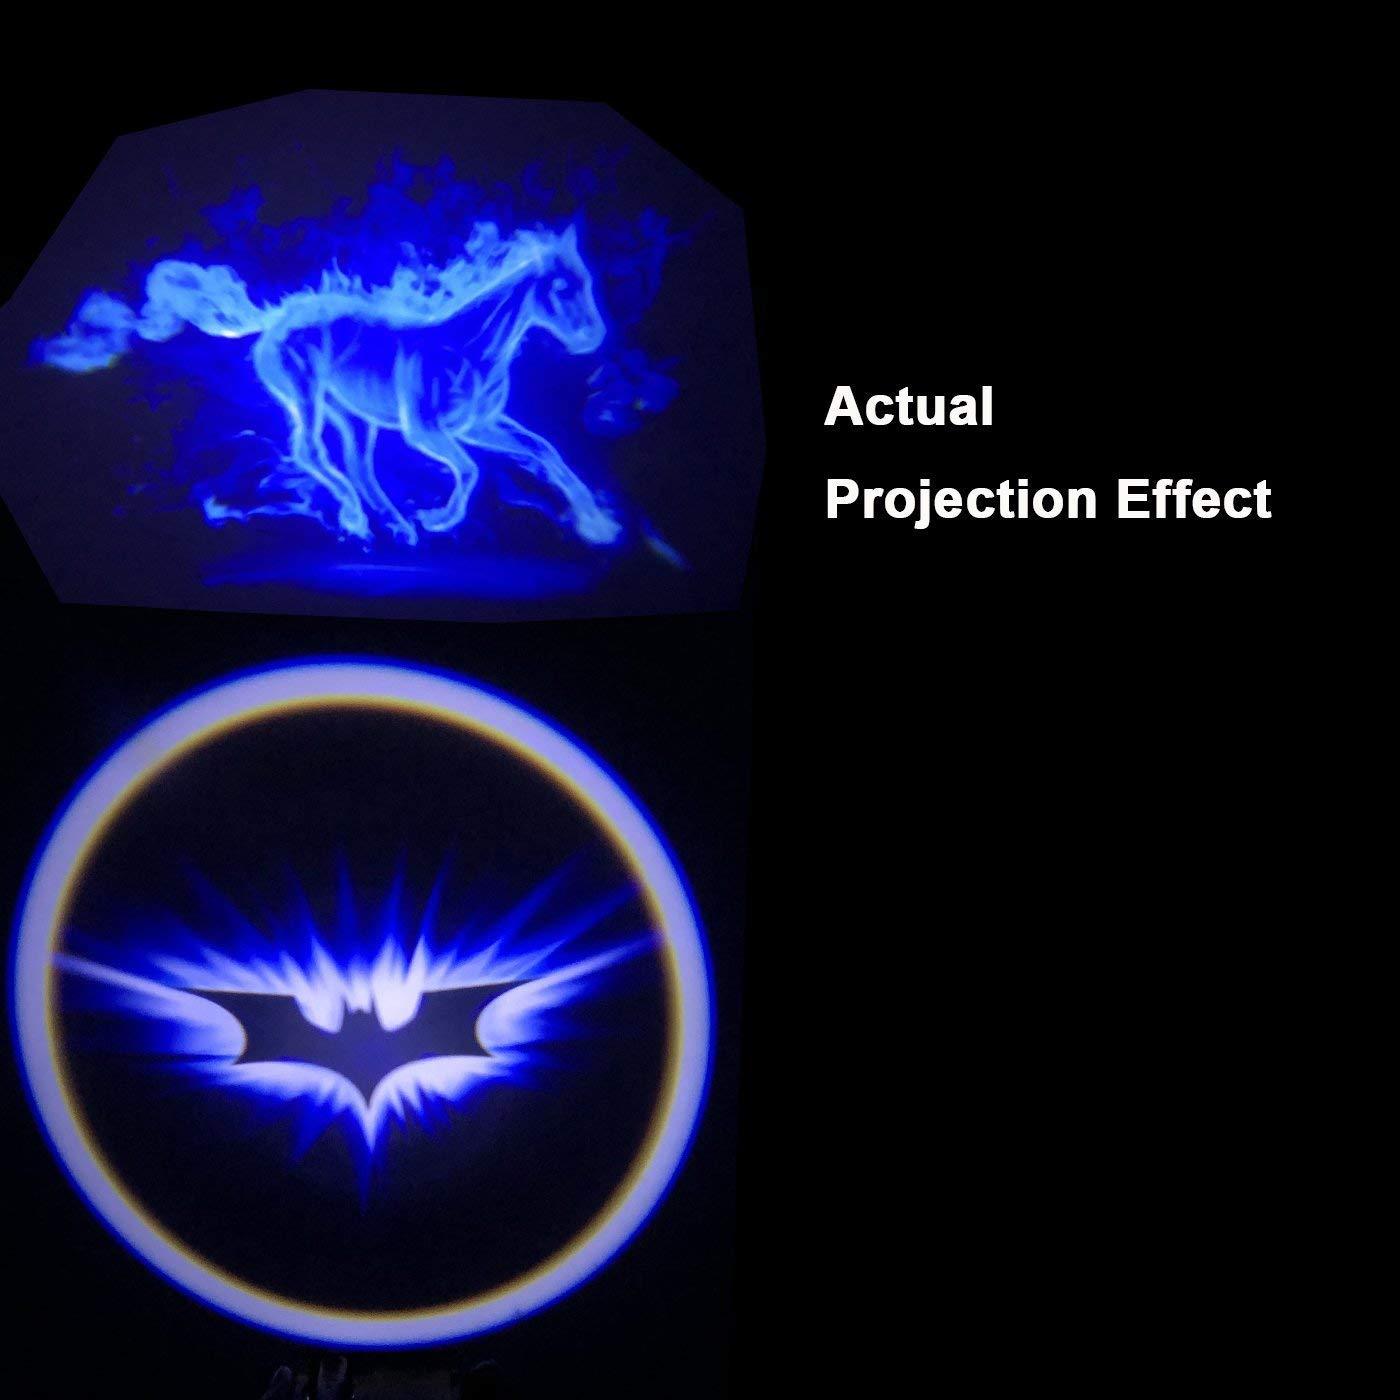 Blaulicht f/ürs Auto 12V Wireless LED Laser Projektor Universal f/ür Ambientebeleuchtung T/ürbeleuchtung Einstiegsleuchte Projektion Licht 2er-Pack